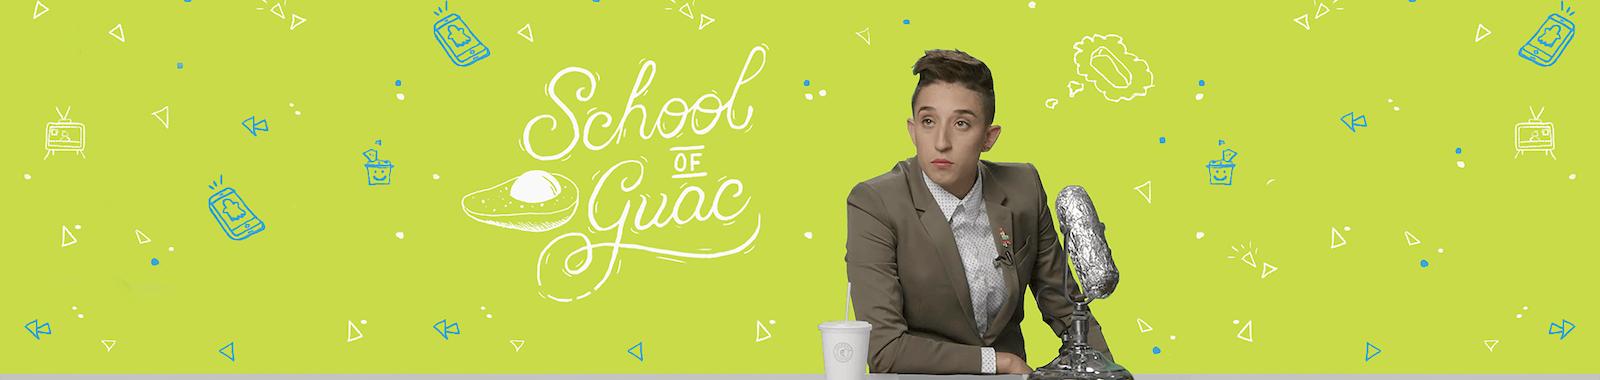 Chipotle apuesta a Snapchat con un programa semanal